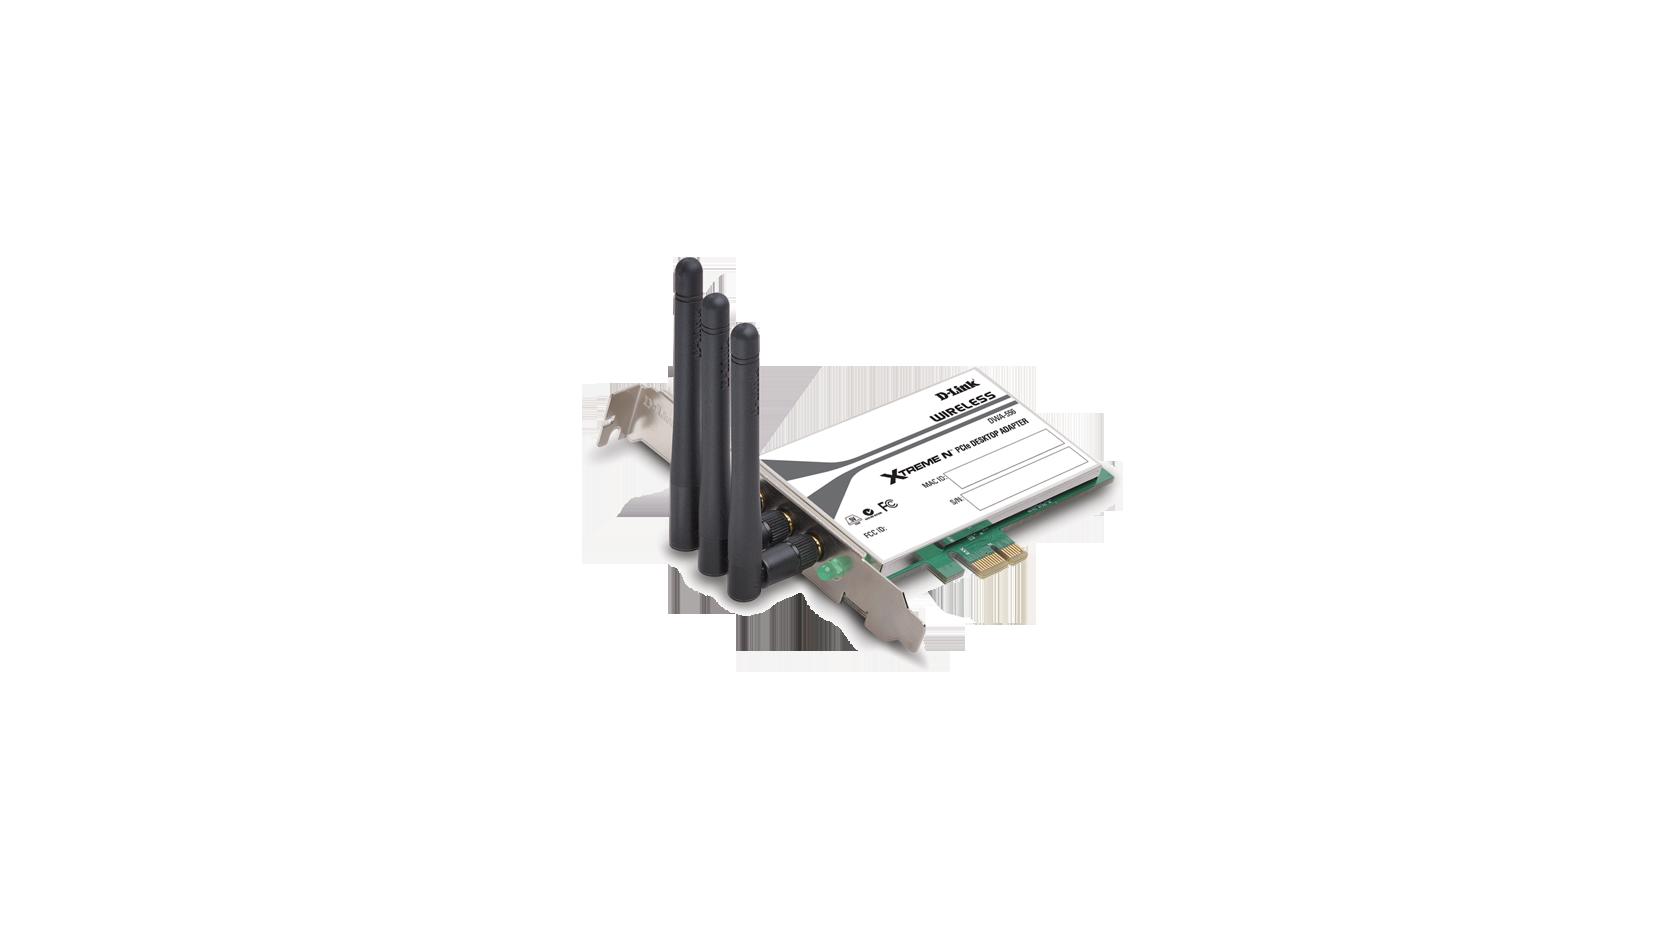 D-Link DWA-566 PCIe Adapter Windows Vista 32-BIT